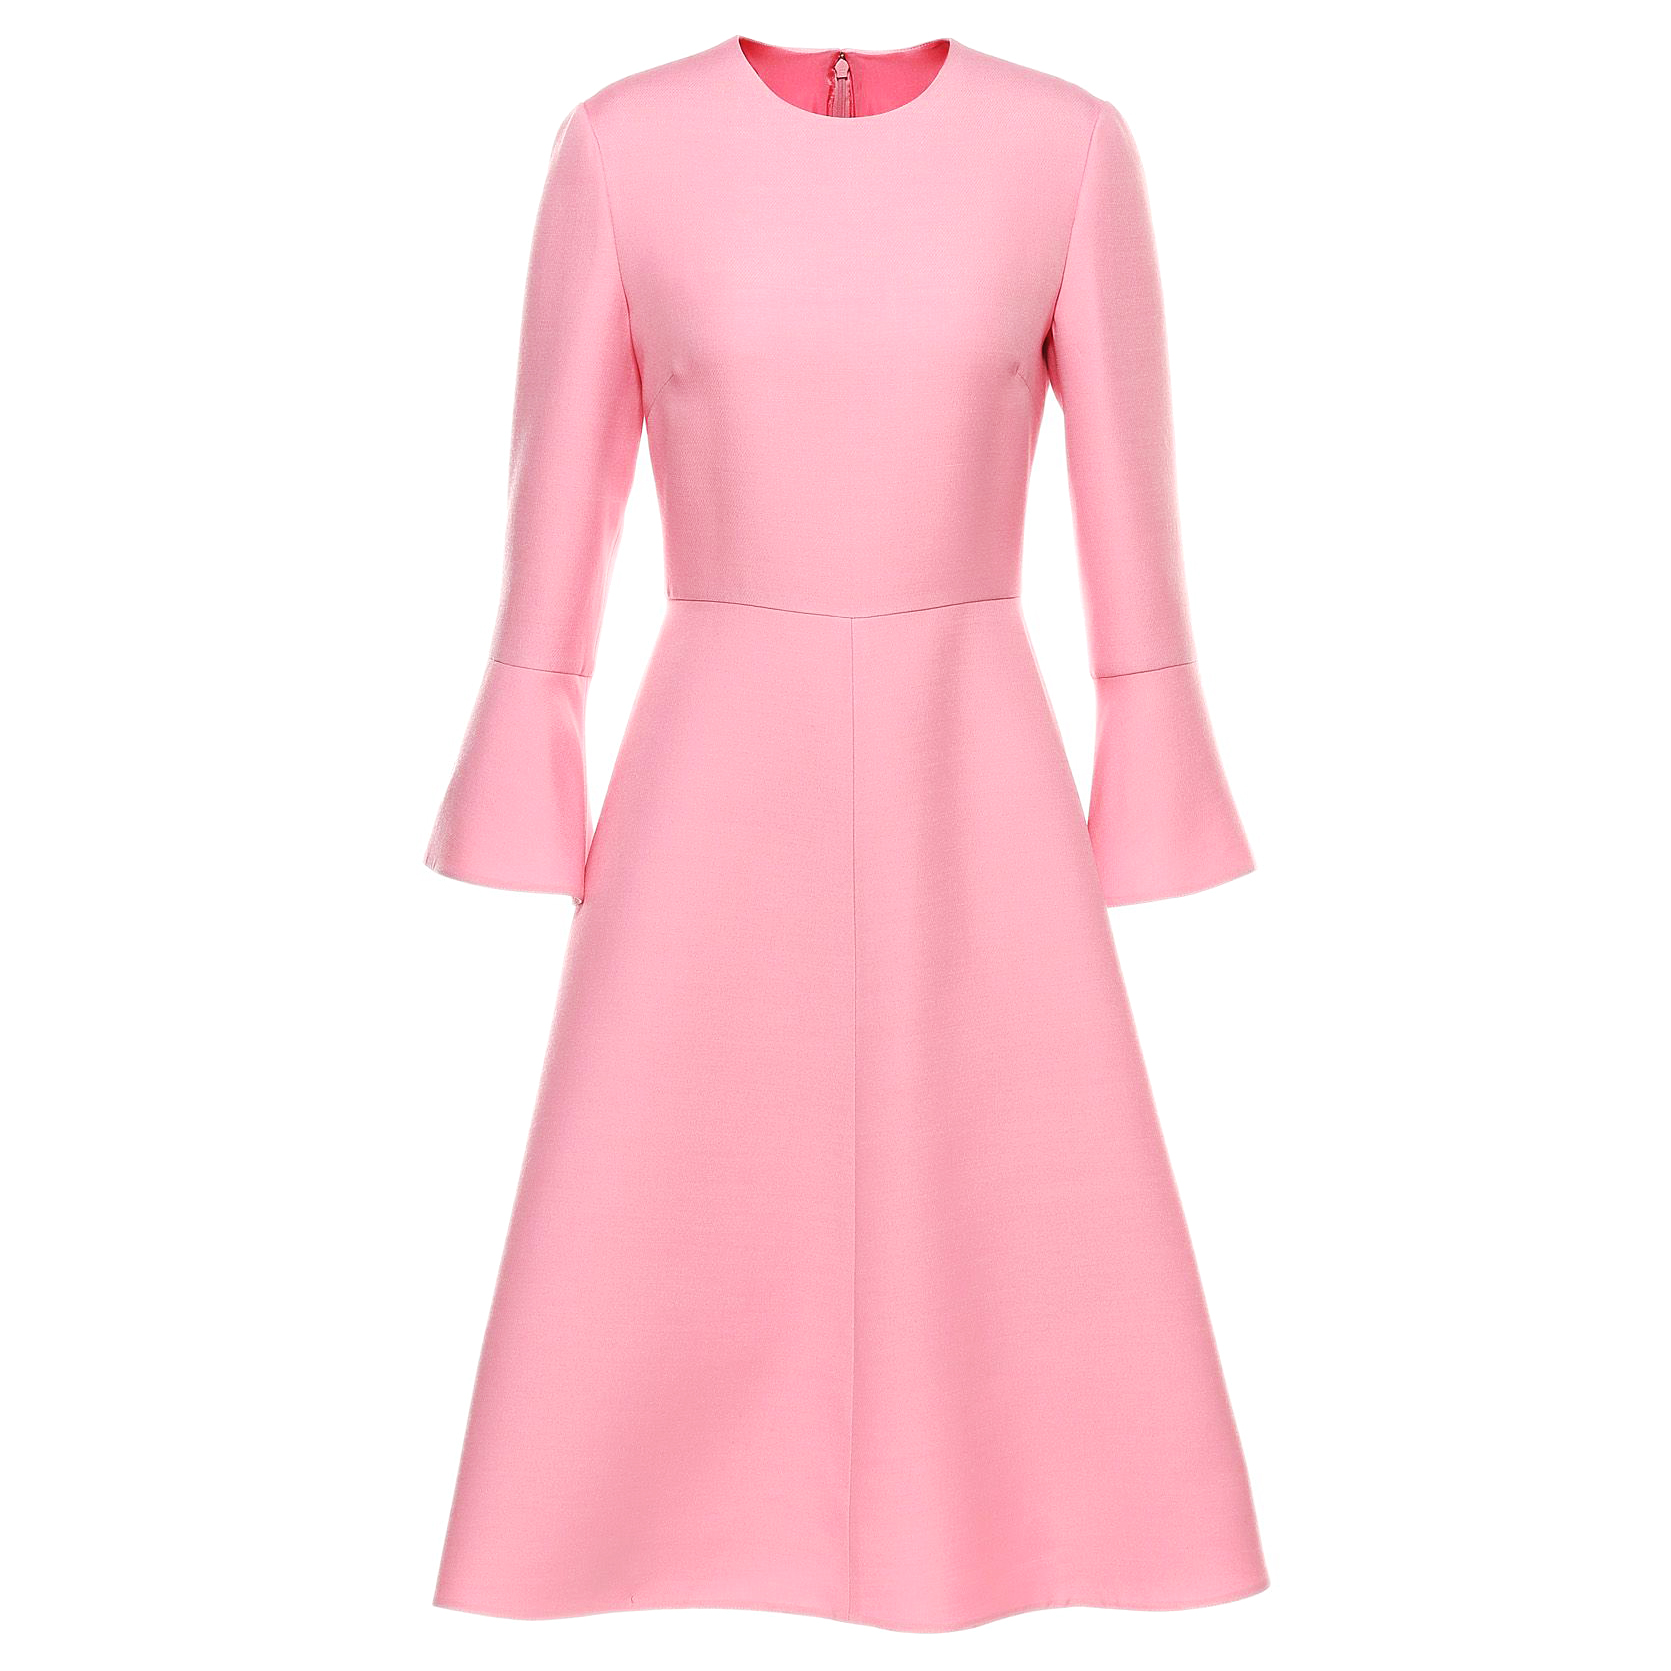 Valentino Pink Crepe Ruffle Sleeve Dress